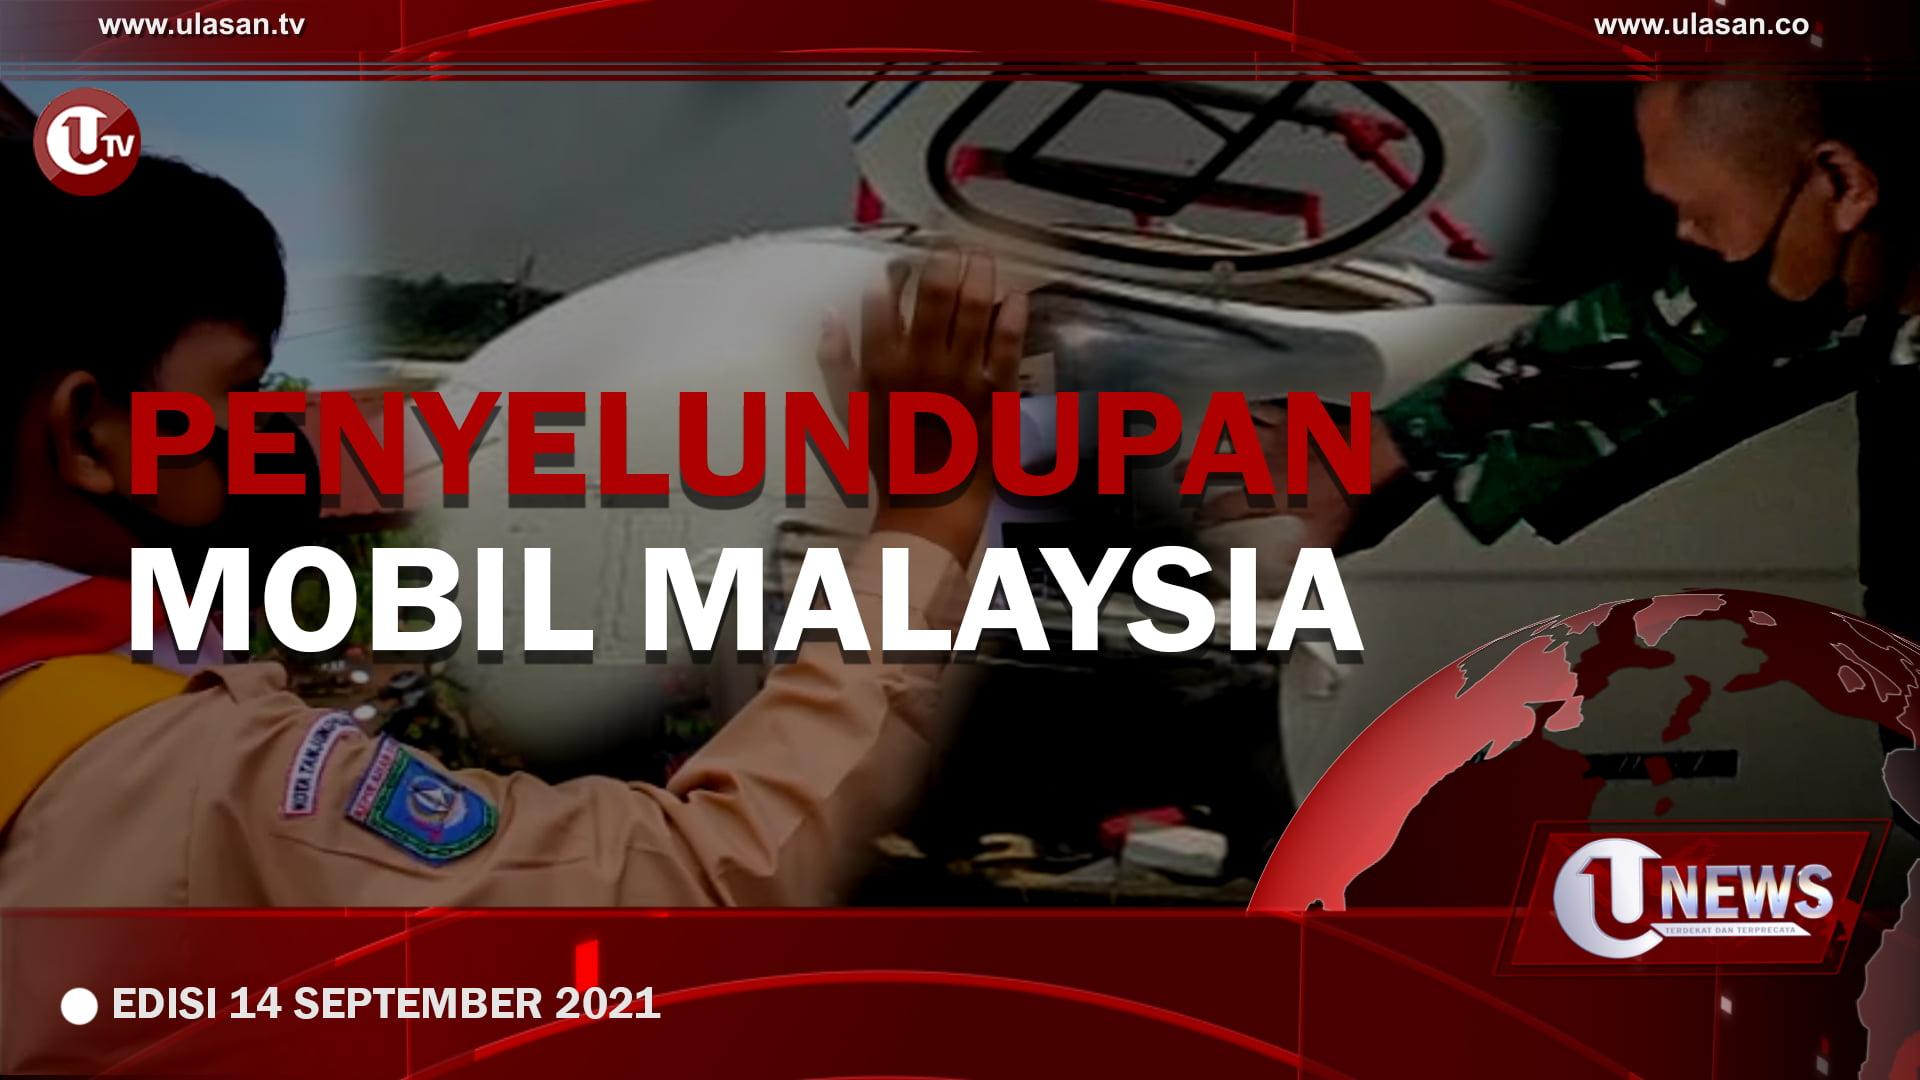 [U-NEWS] Penyelundupan Mobil Malaysia   U-NEWS EDISI 14 SEPTEMBER 2021